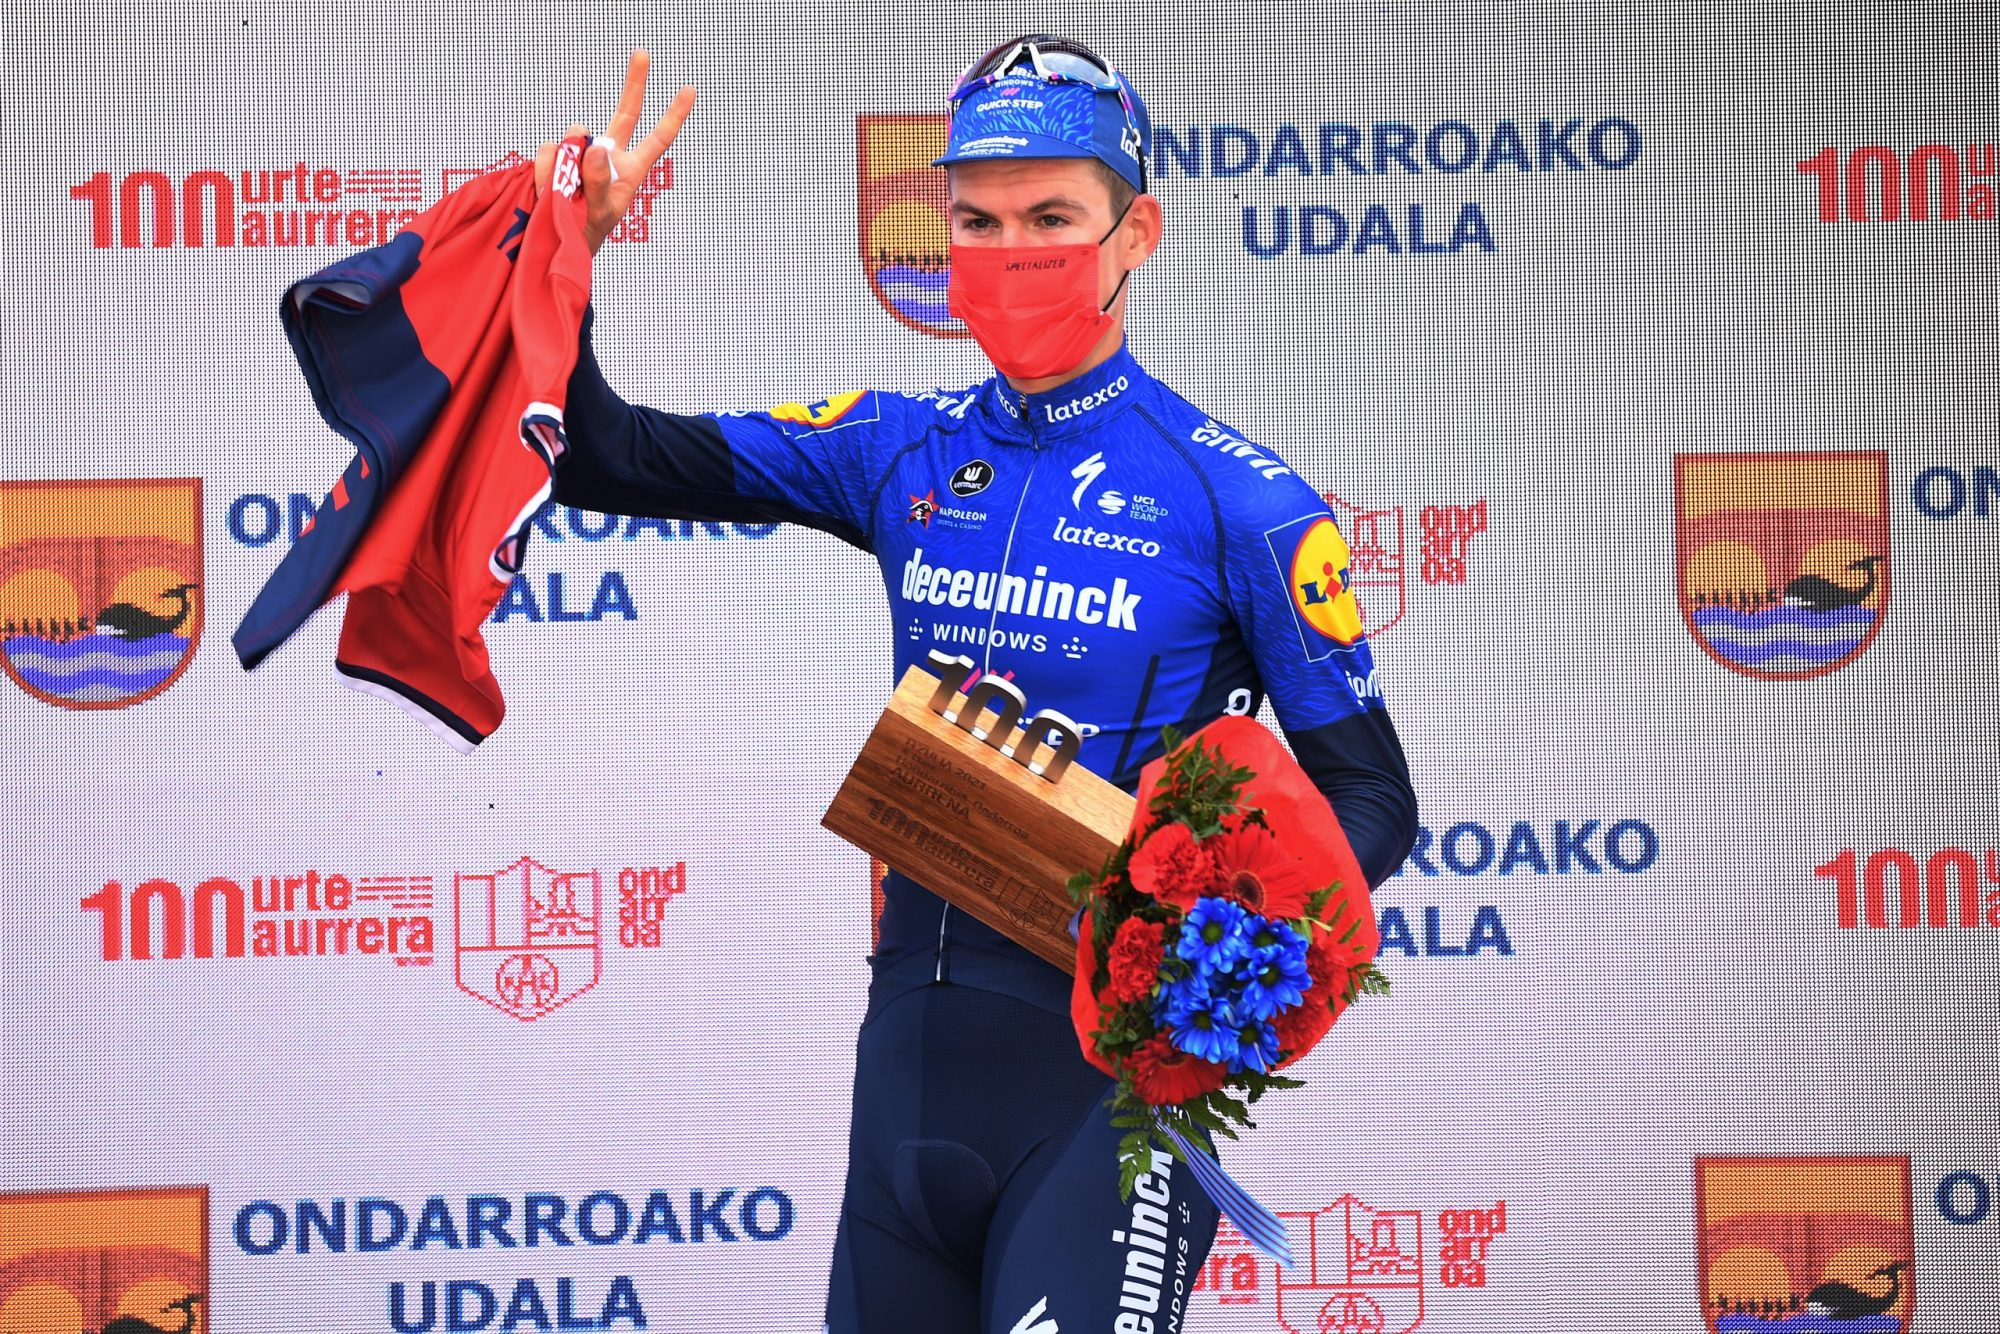 'Ci ispiriamo costantemente': Deceuninck – Quick-Step vola dopo la quindicesima vittoria stagionale al Tour of the Basque Country